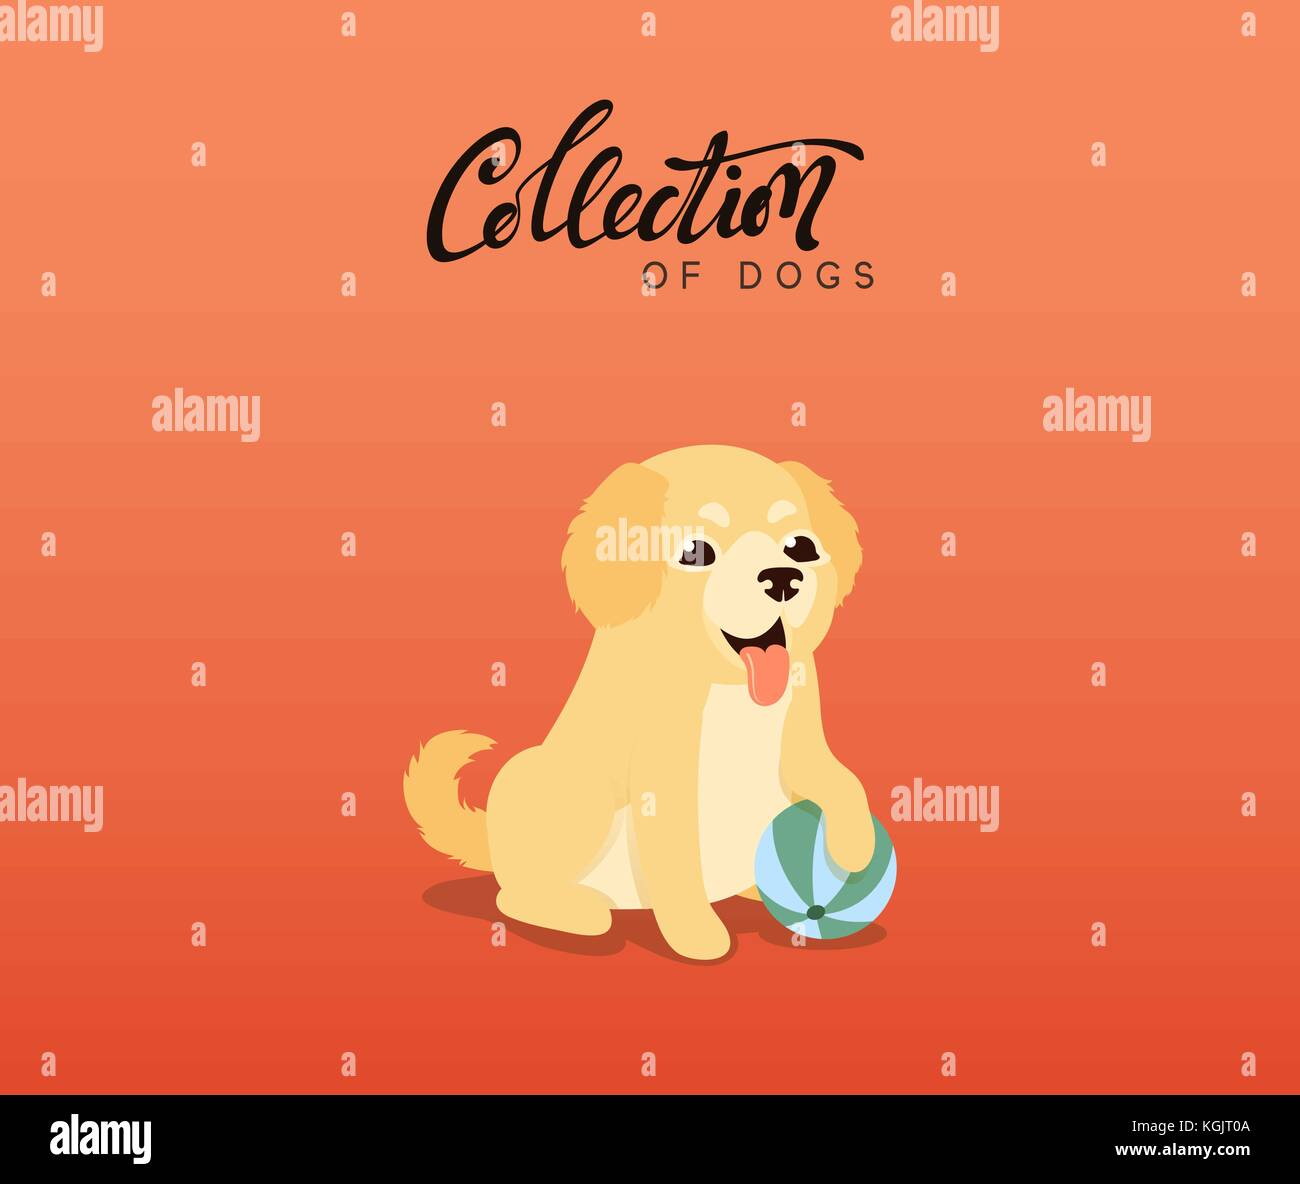 Cute Dogs Labrador And Golden Retriever Flat Animal Cartoon Stock